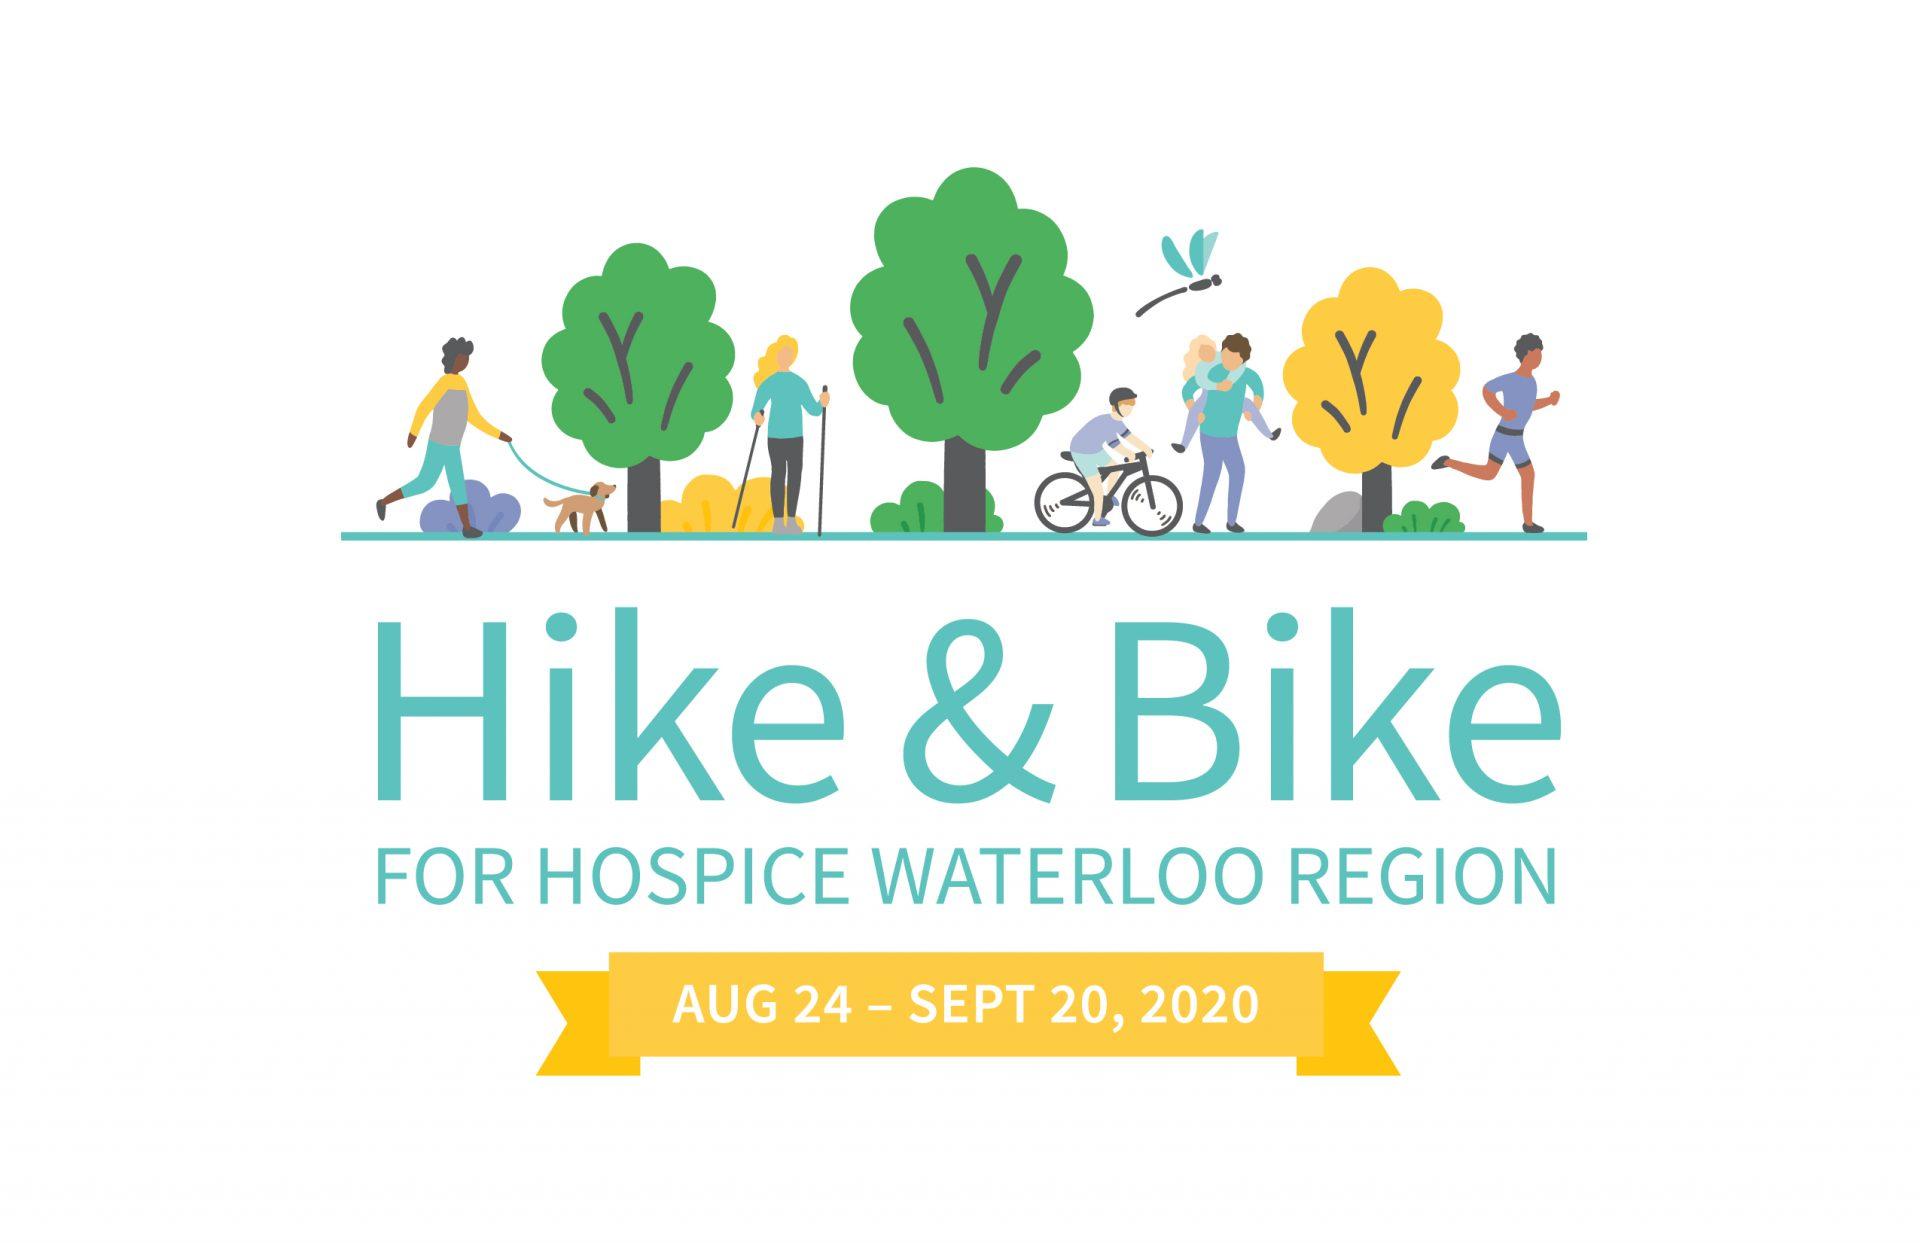 Hike and Bike for Hospice